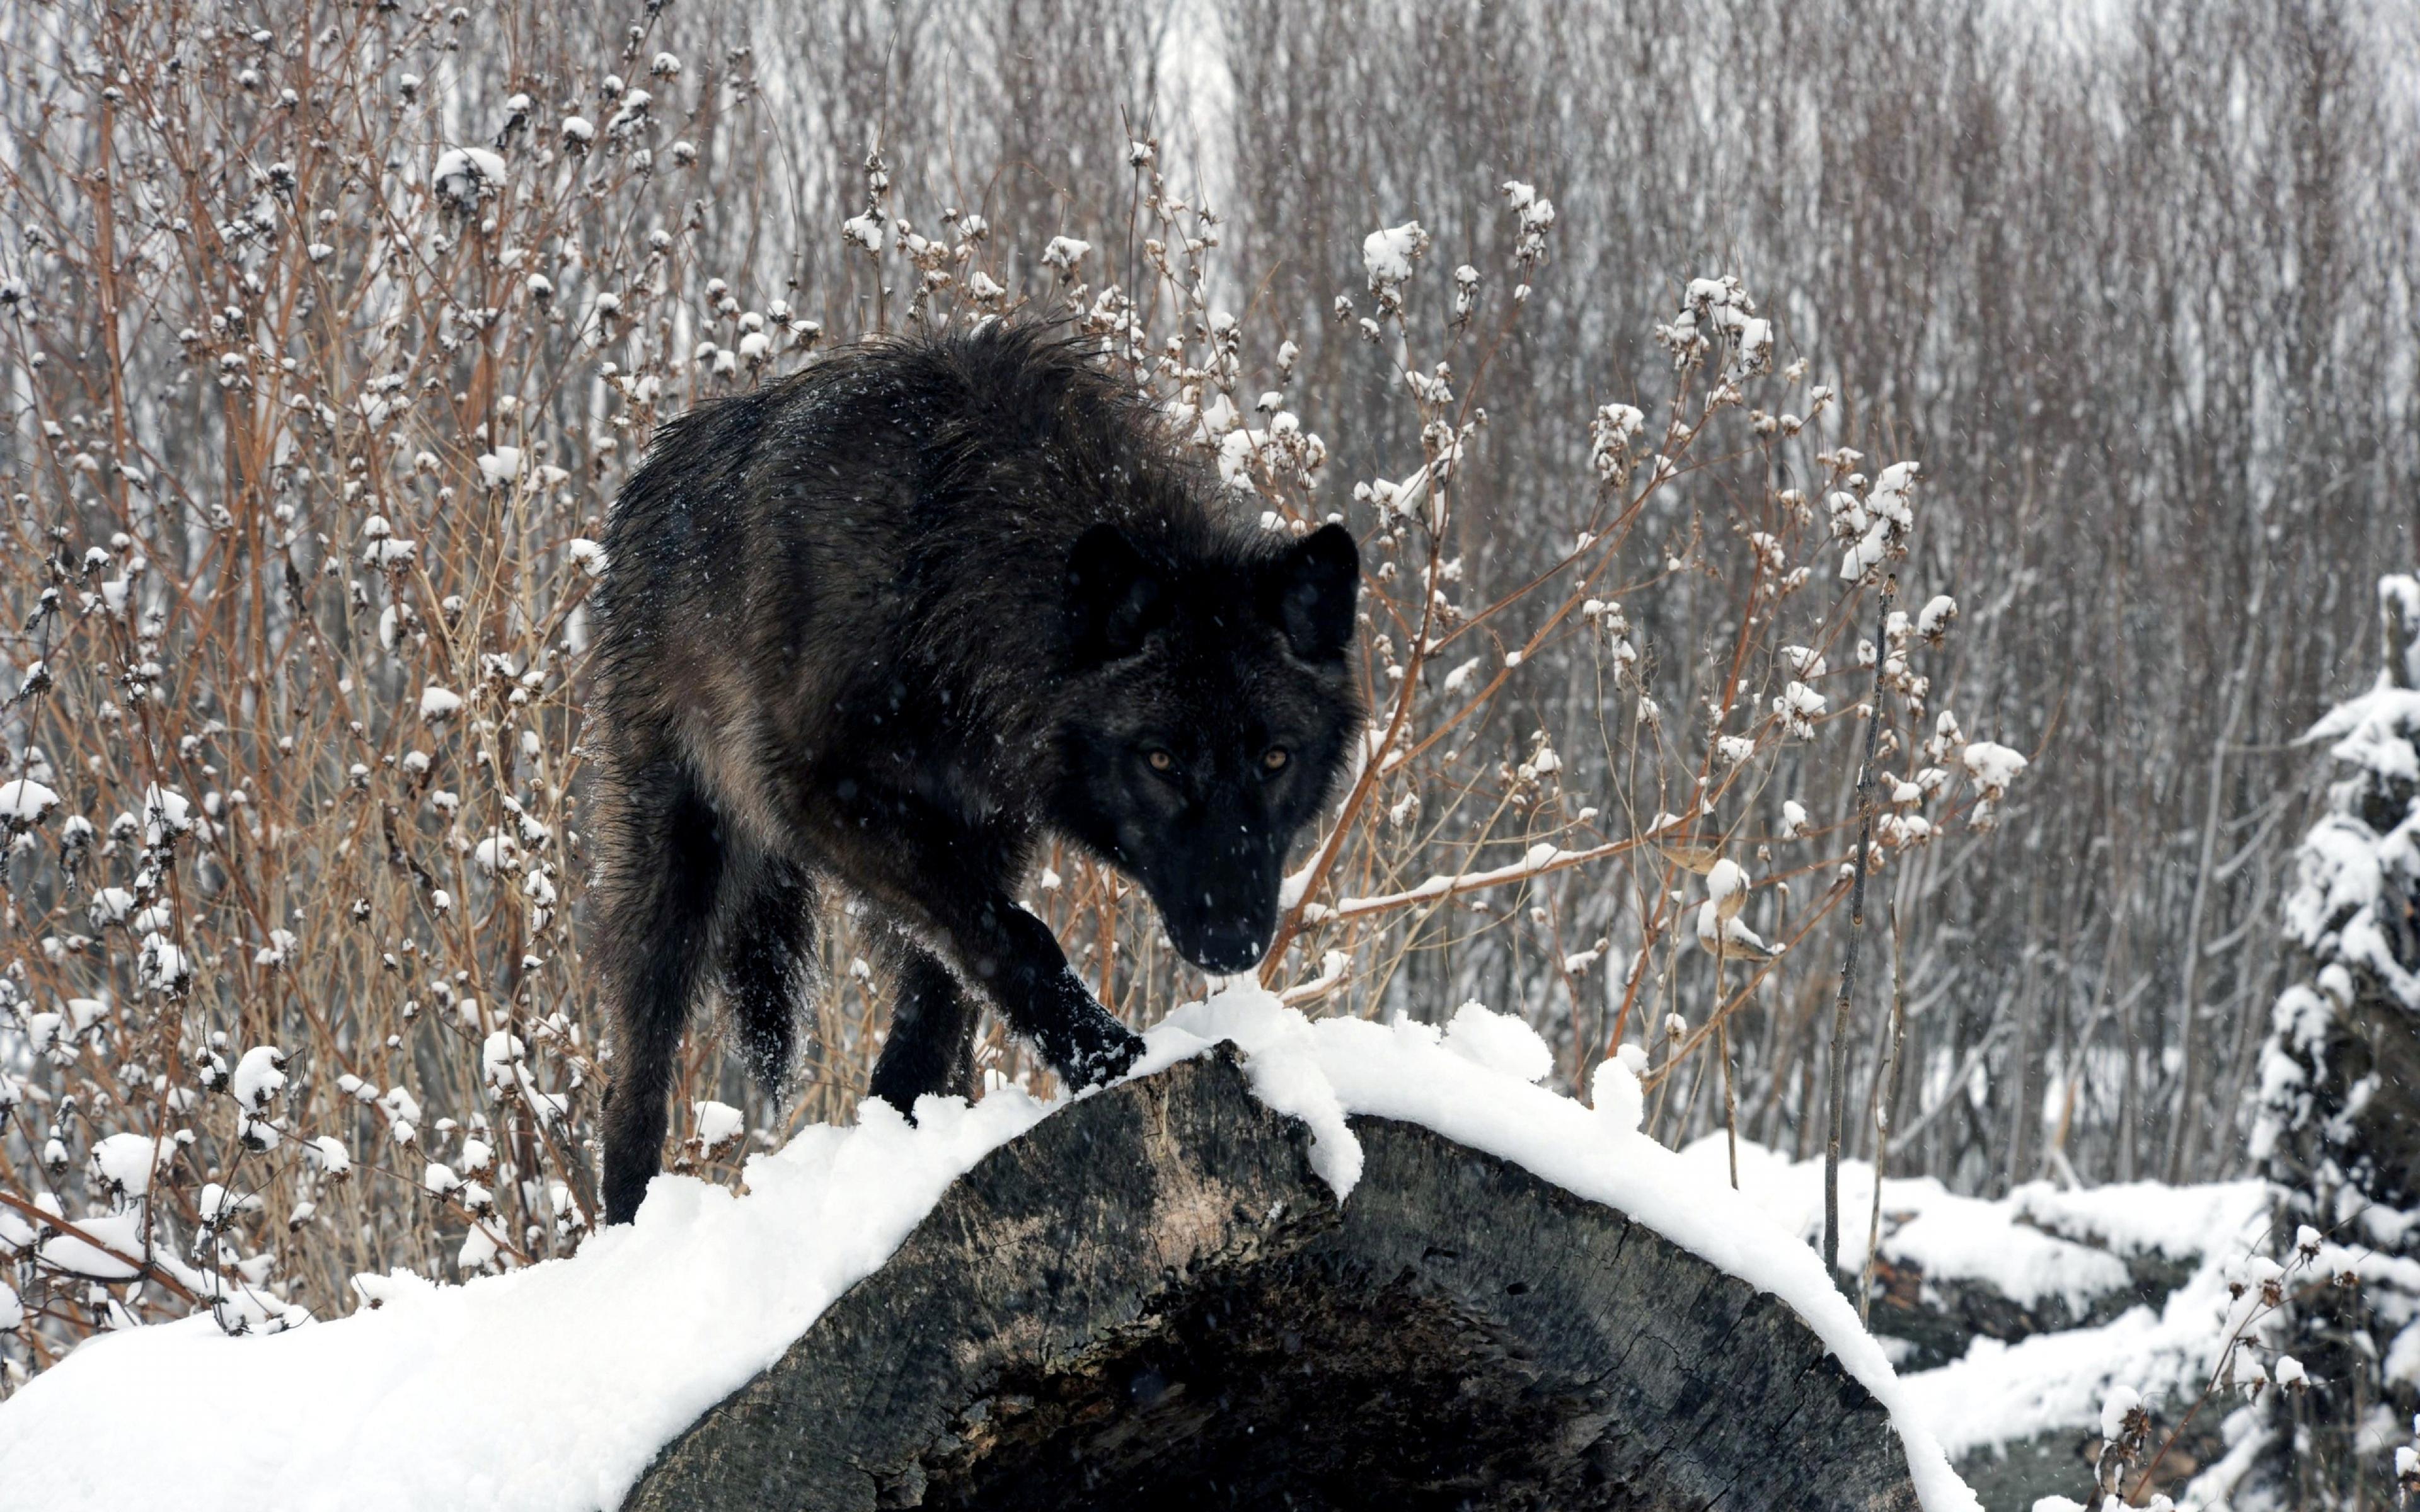 Winter Look Wolf Snow Logs Wood Wallpaper Background Ultra HD 4K 3840x2400